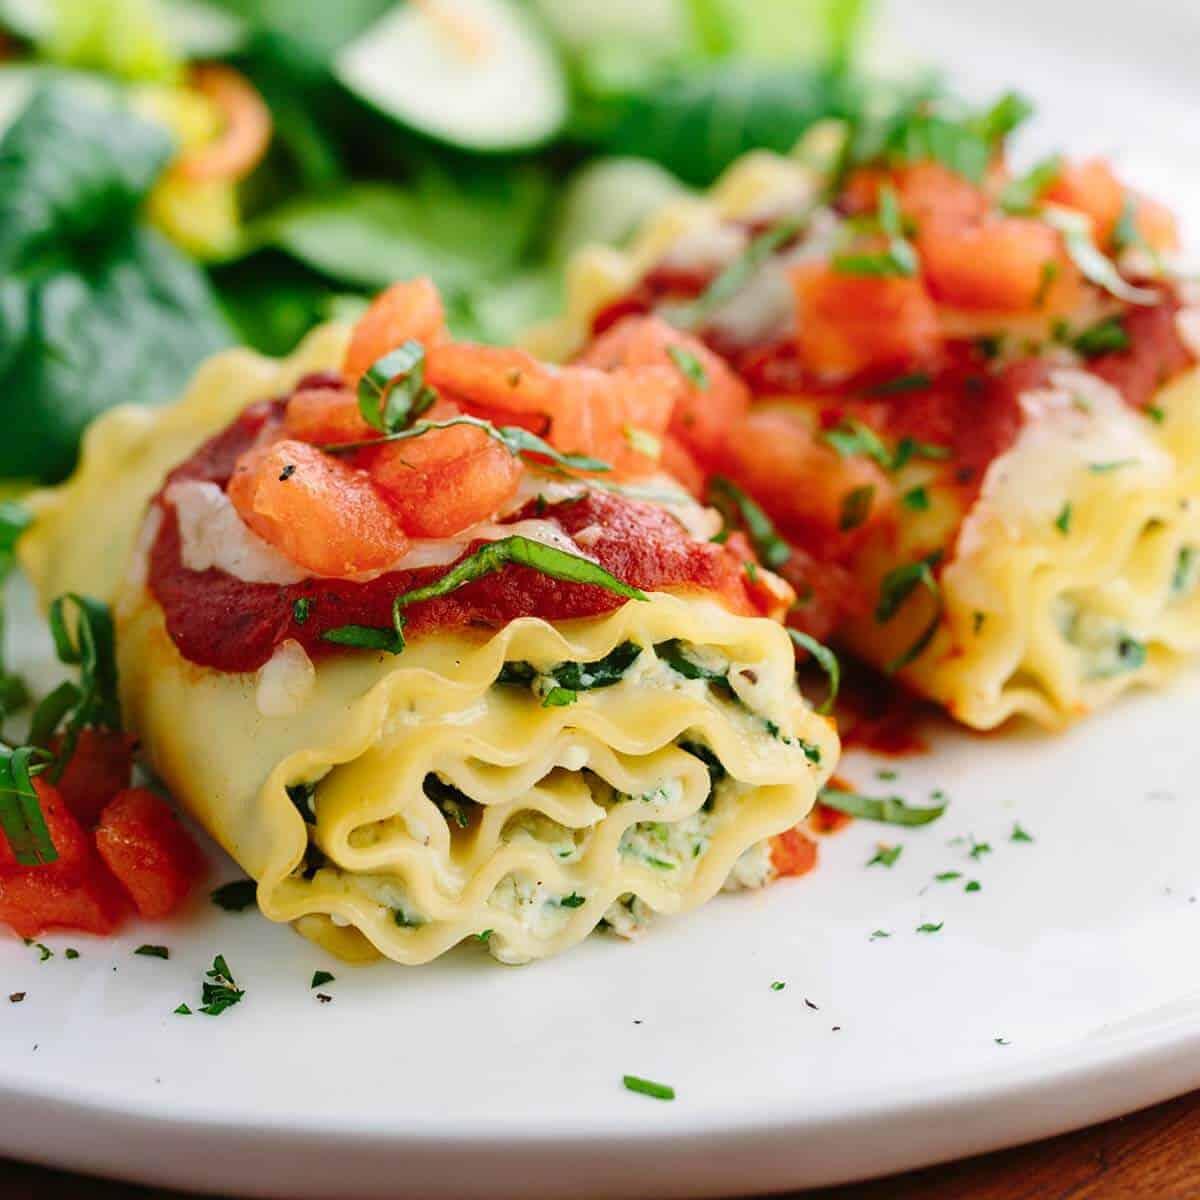 Homemade Italian Lasagna Rolls With Vegetables